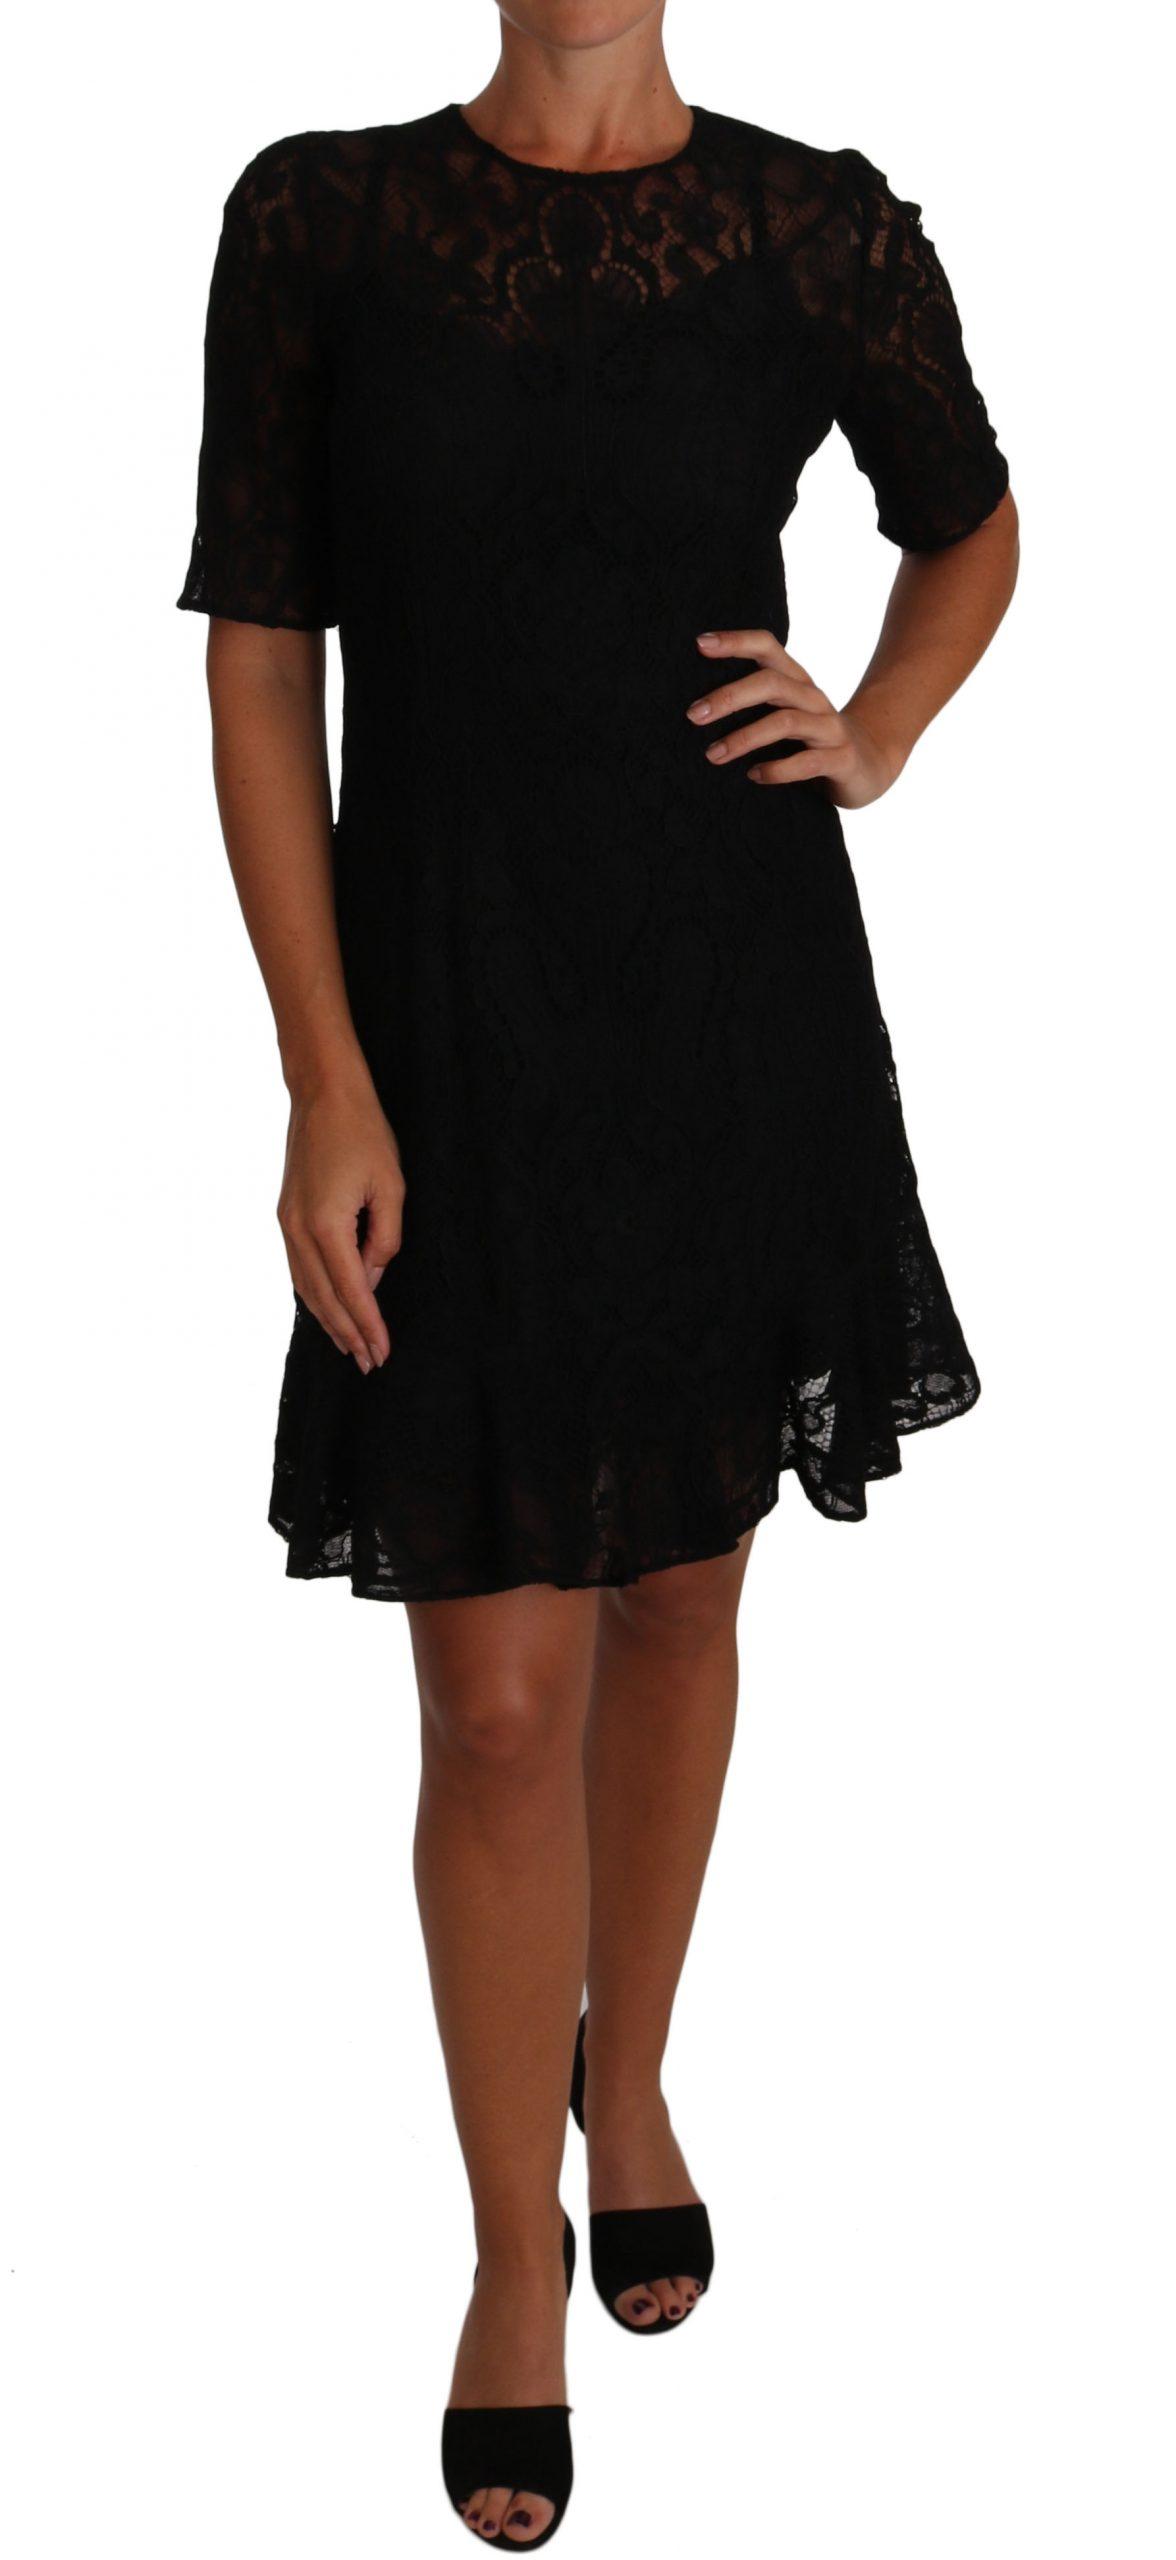 Dolce & Gabbana Women's Floral Lace Sheath SS Dress Black DR1500 - IT40|S